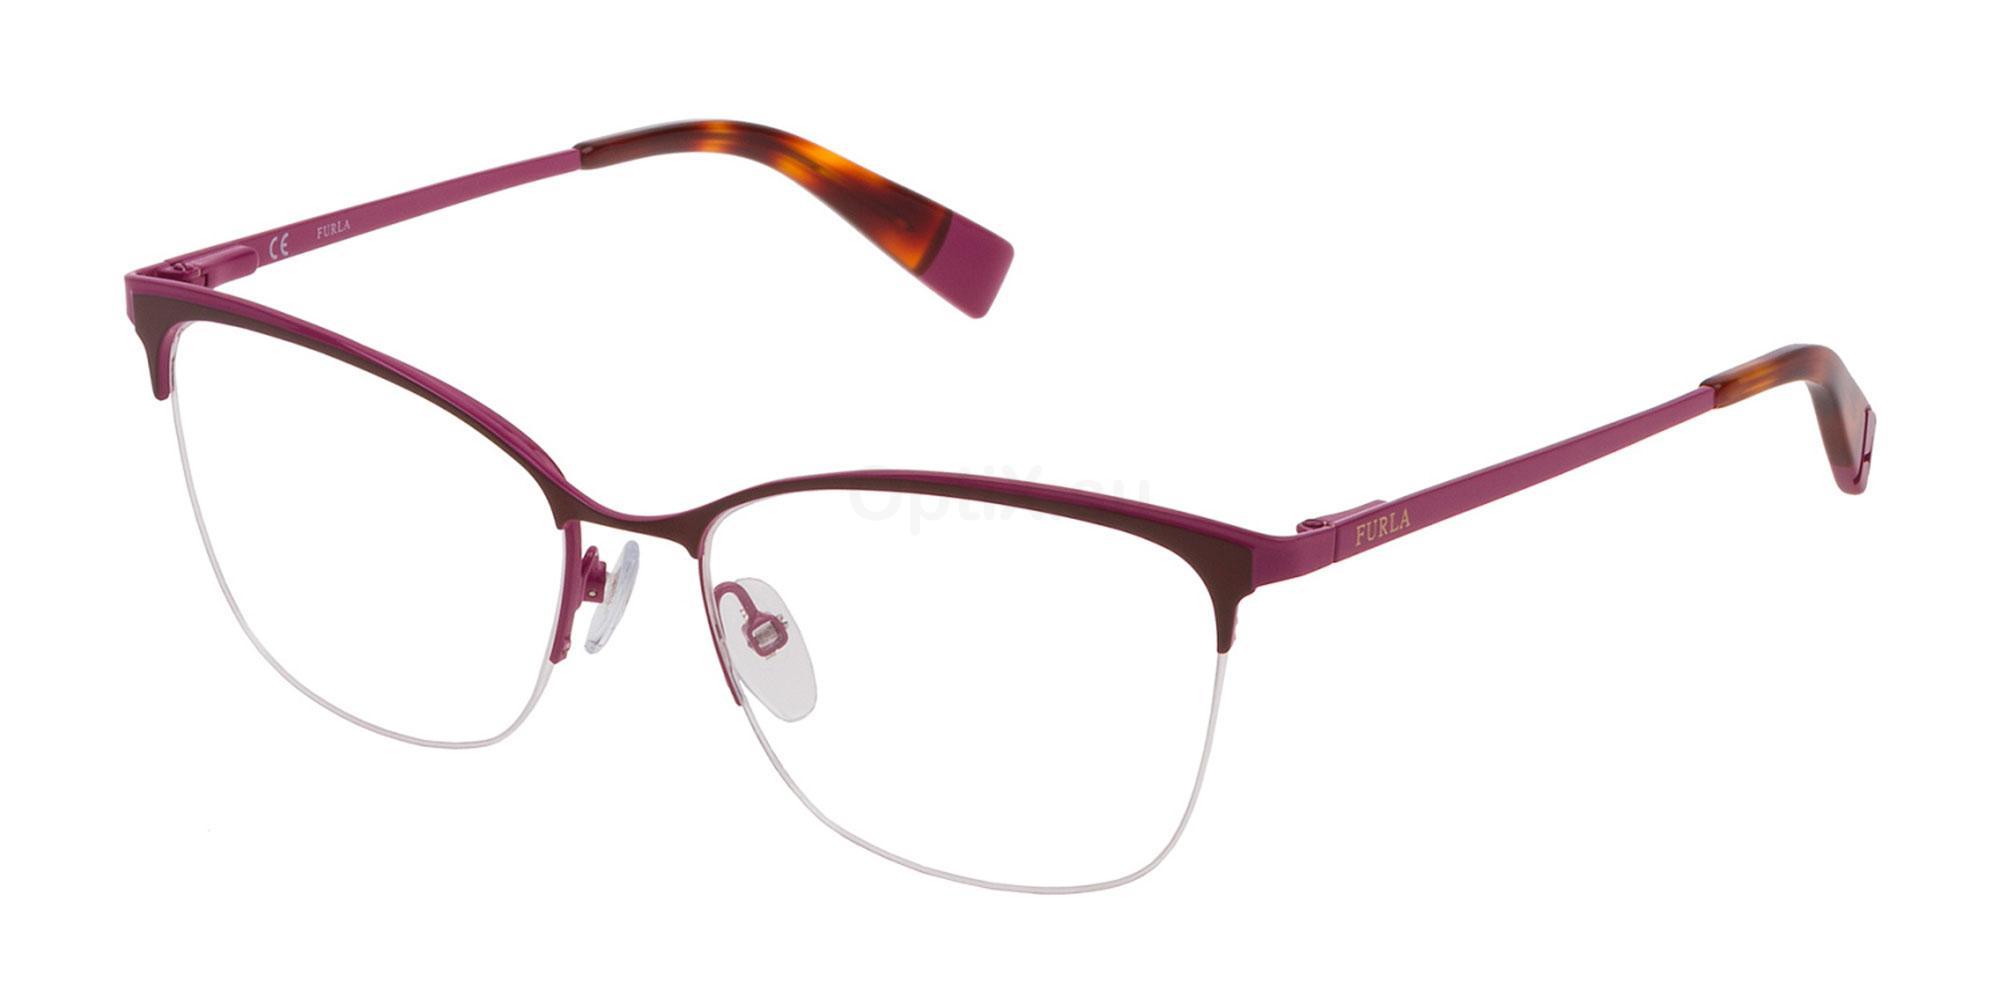 0483 VFU184 Glasses, Furla